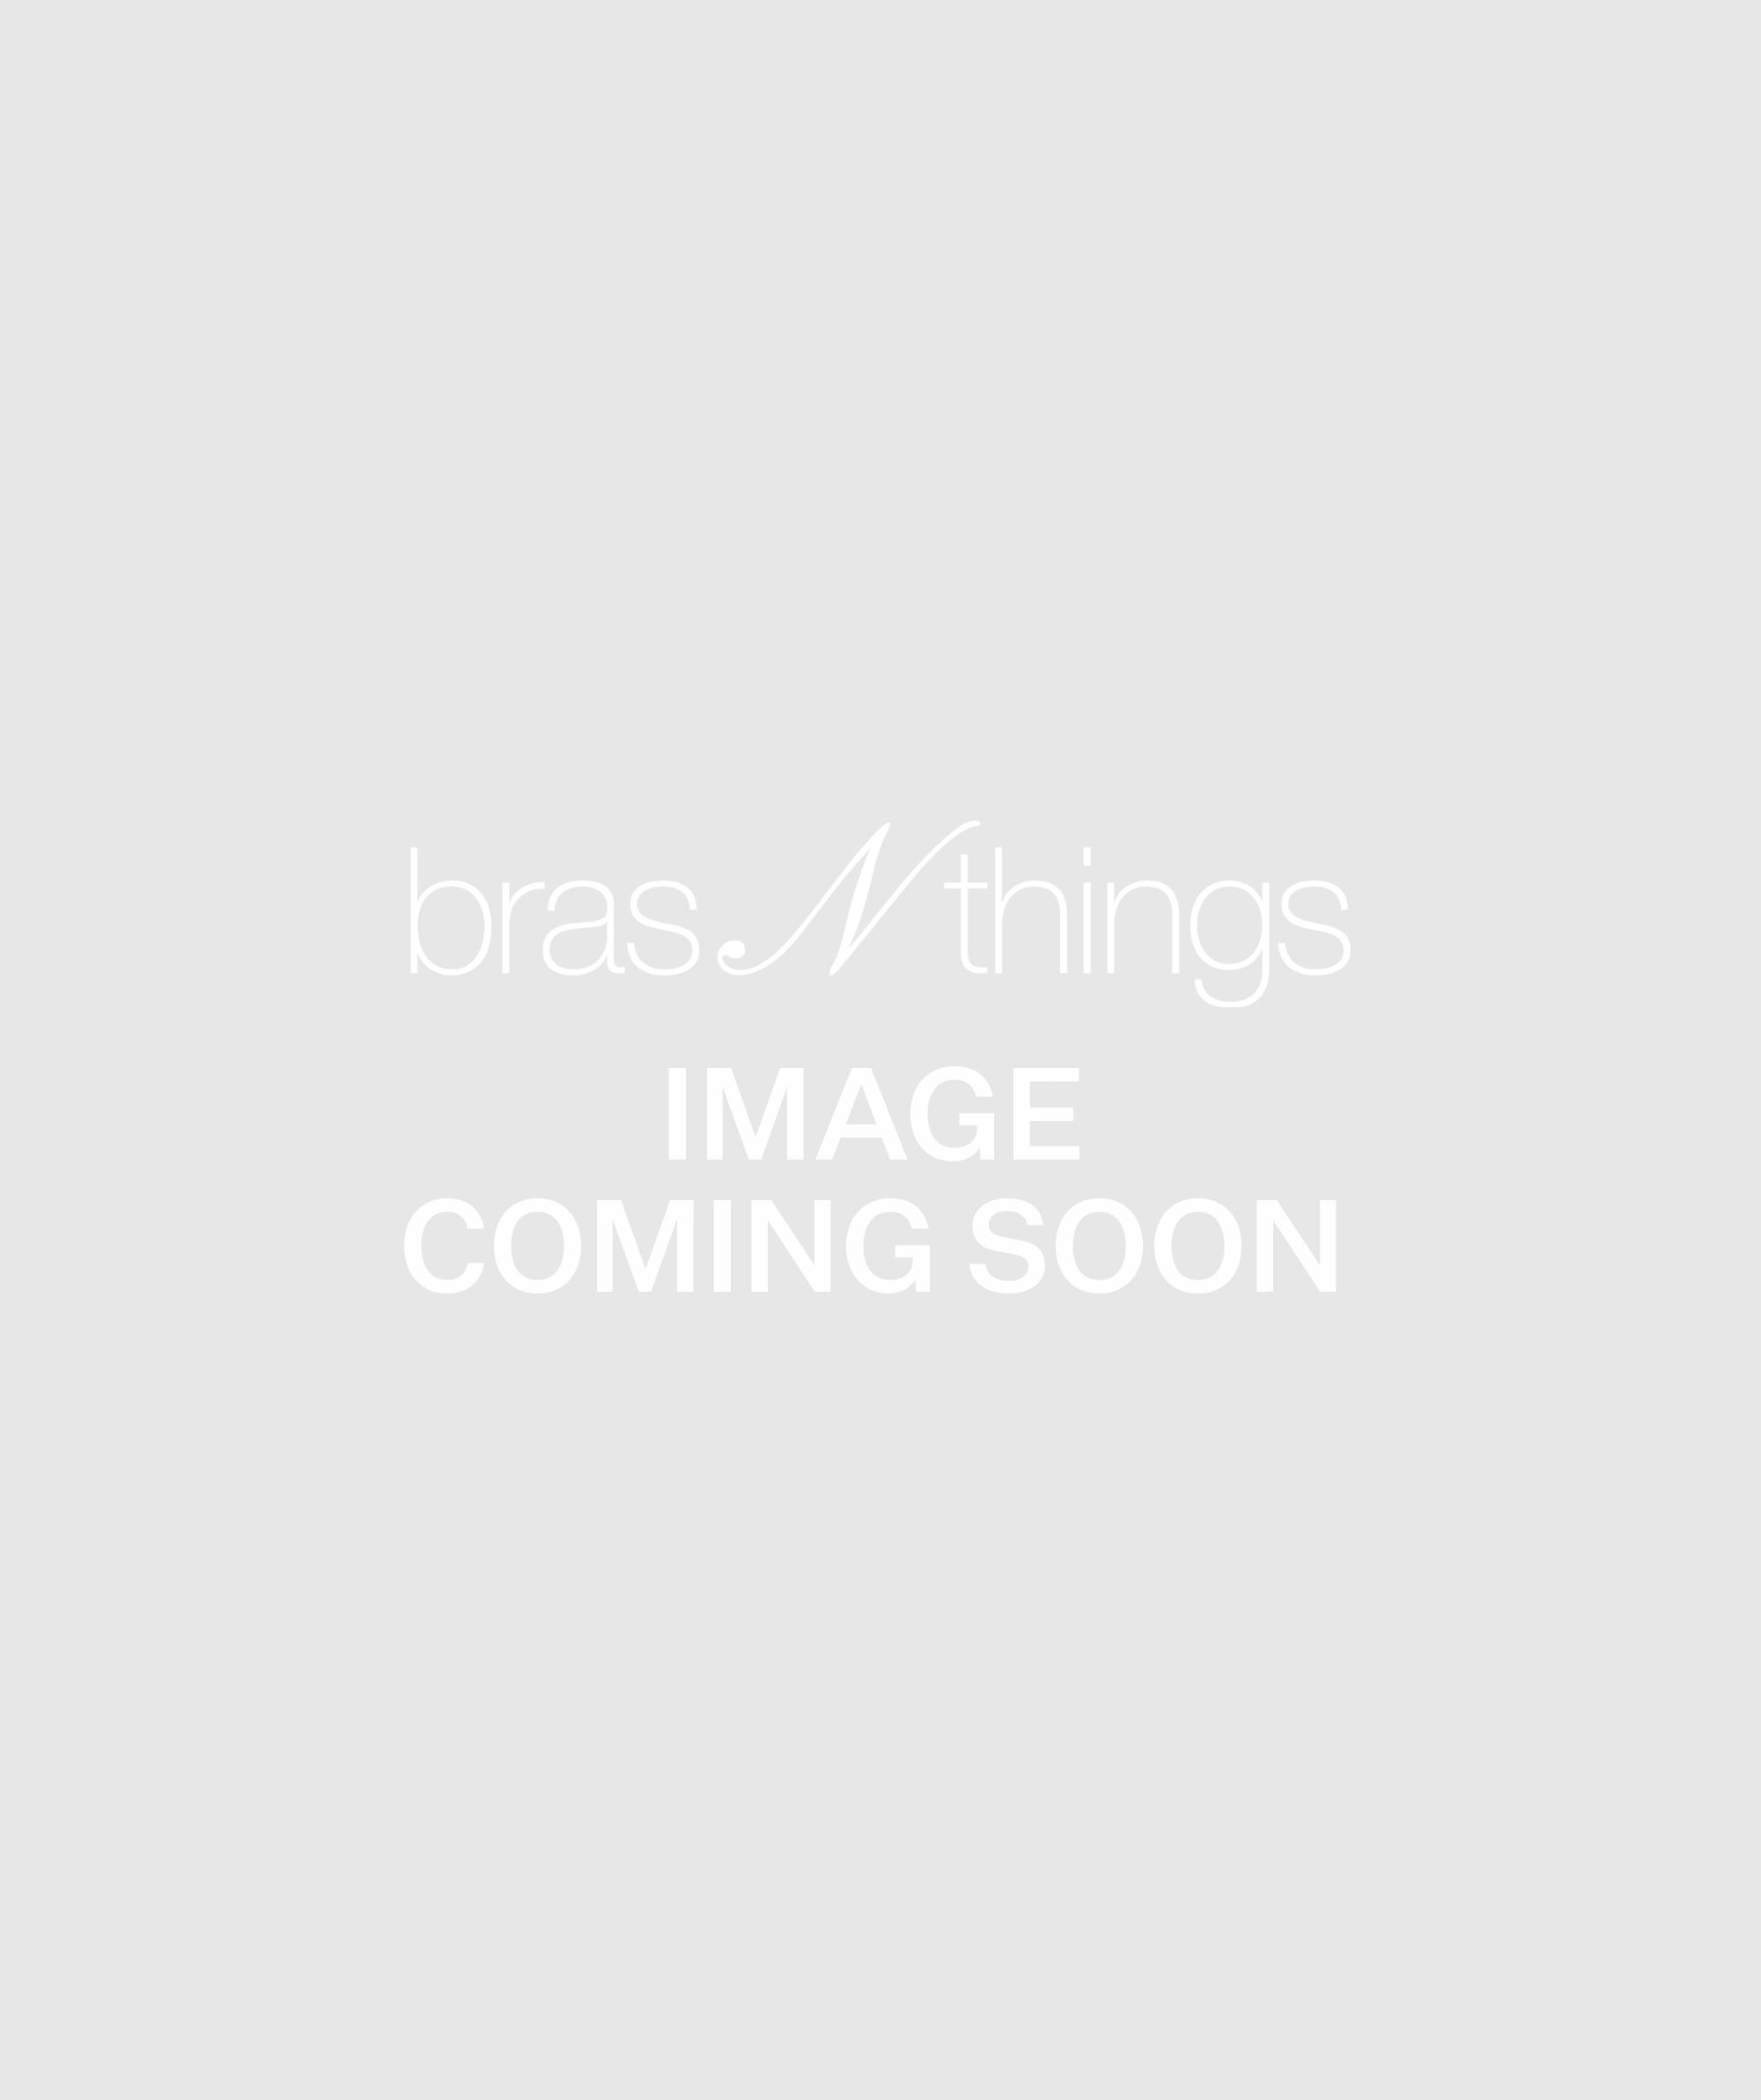 Cosette Suspender - Black/ Nude